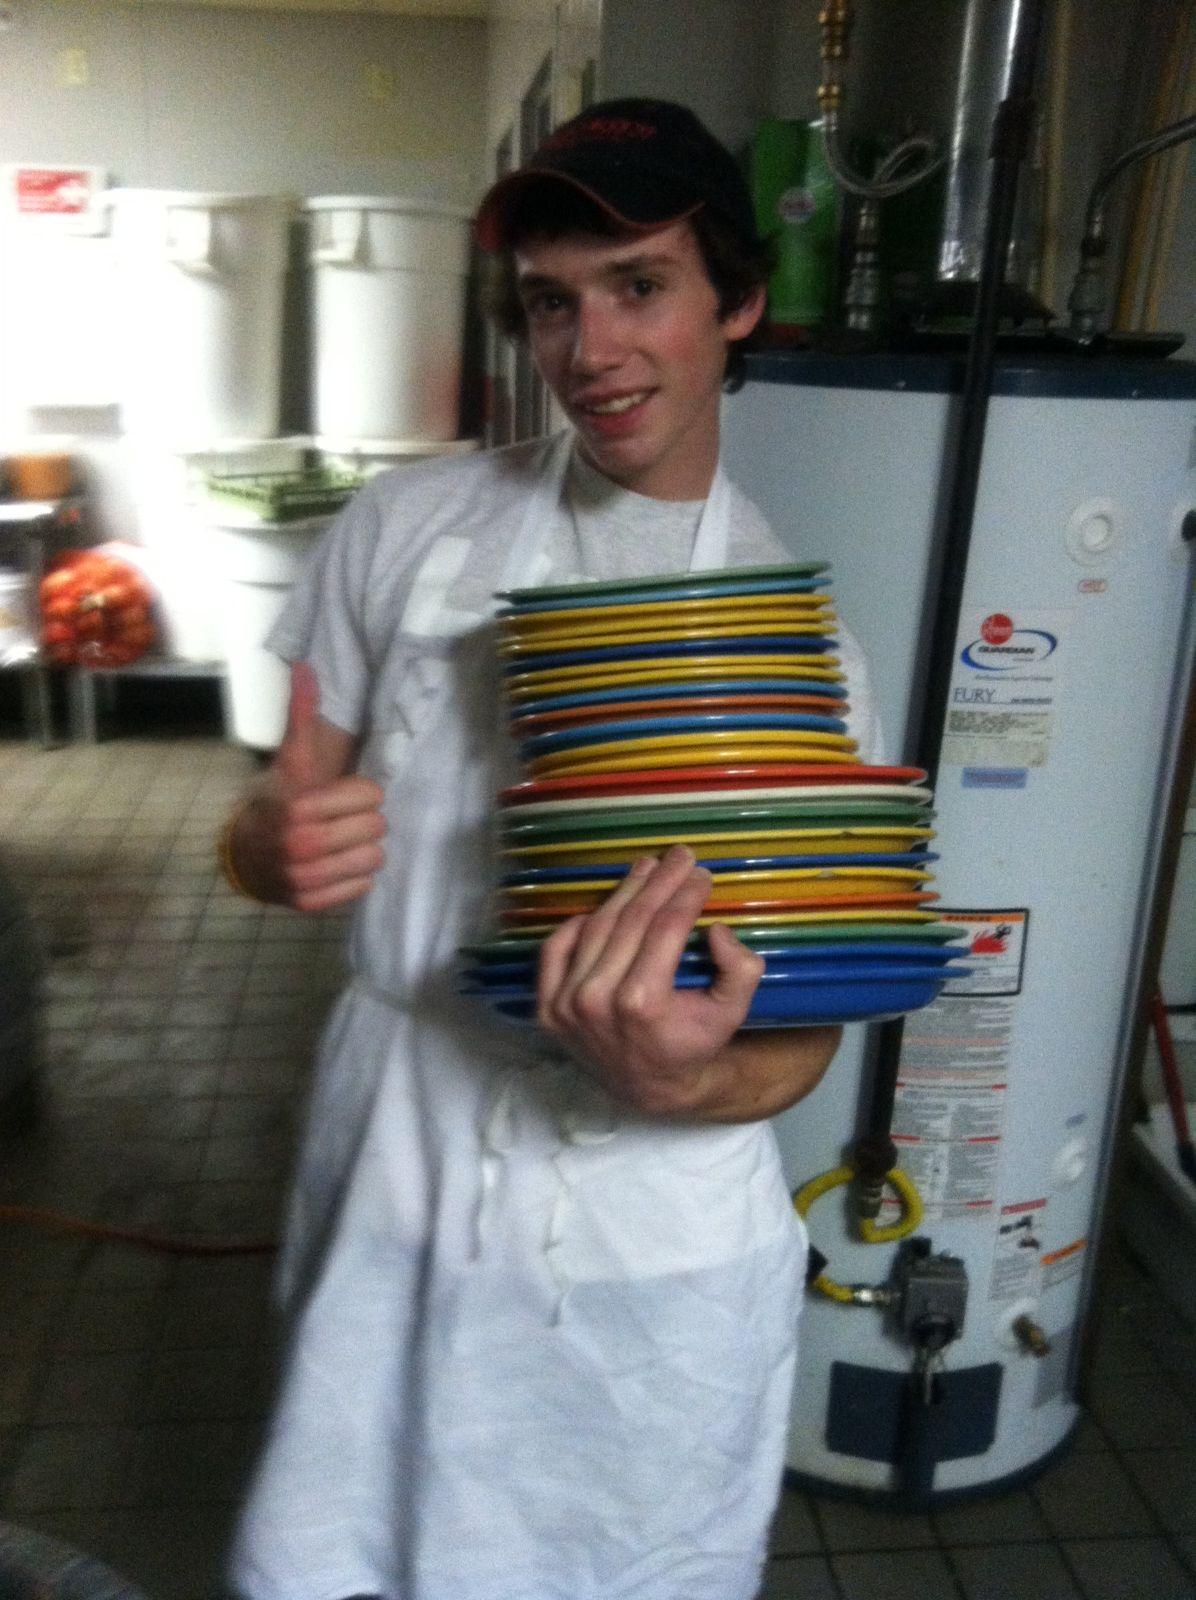 Those plates do weigh quite a bit